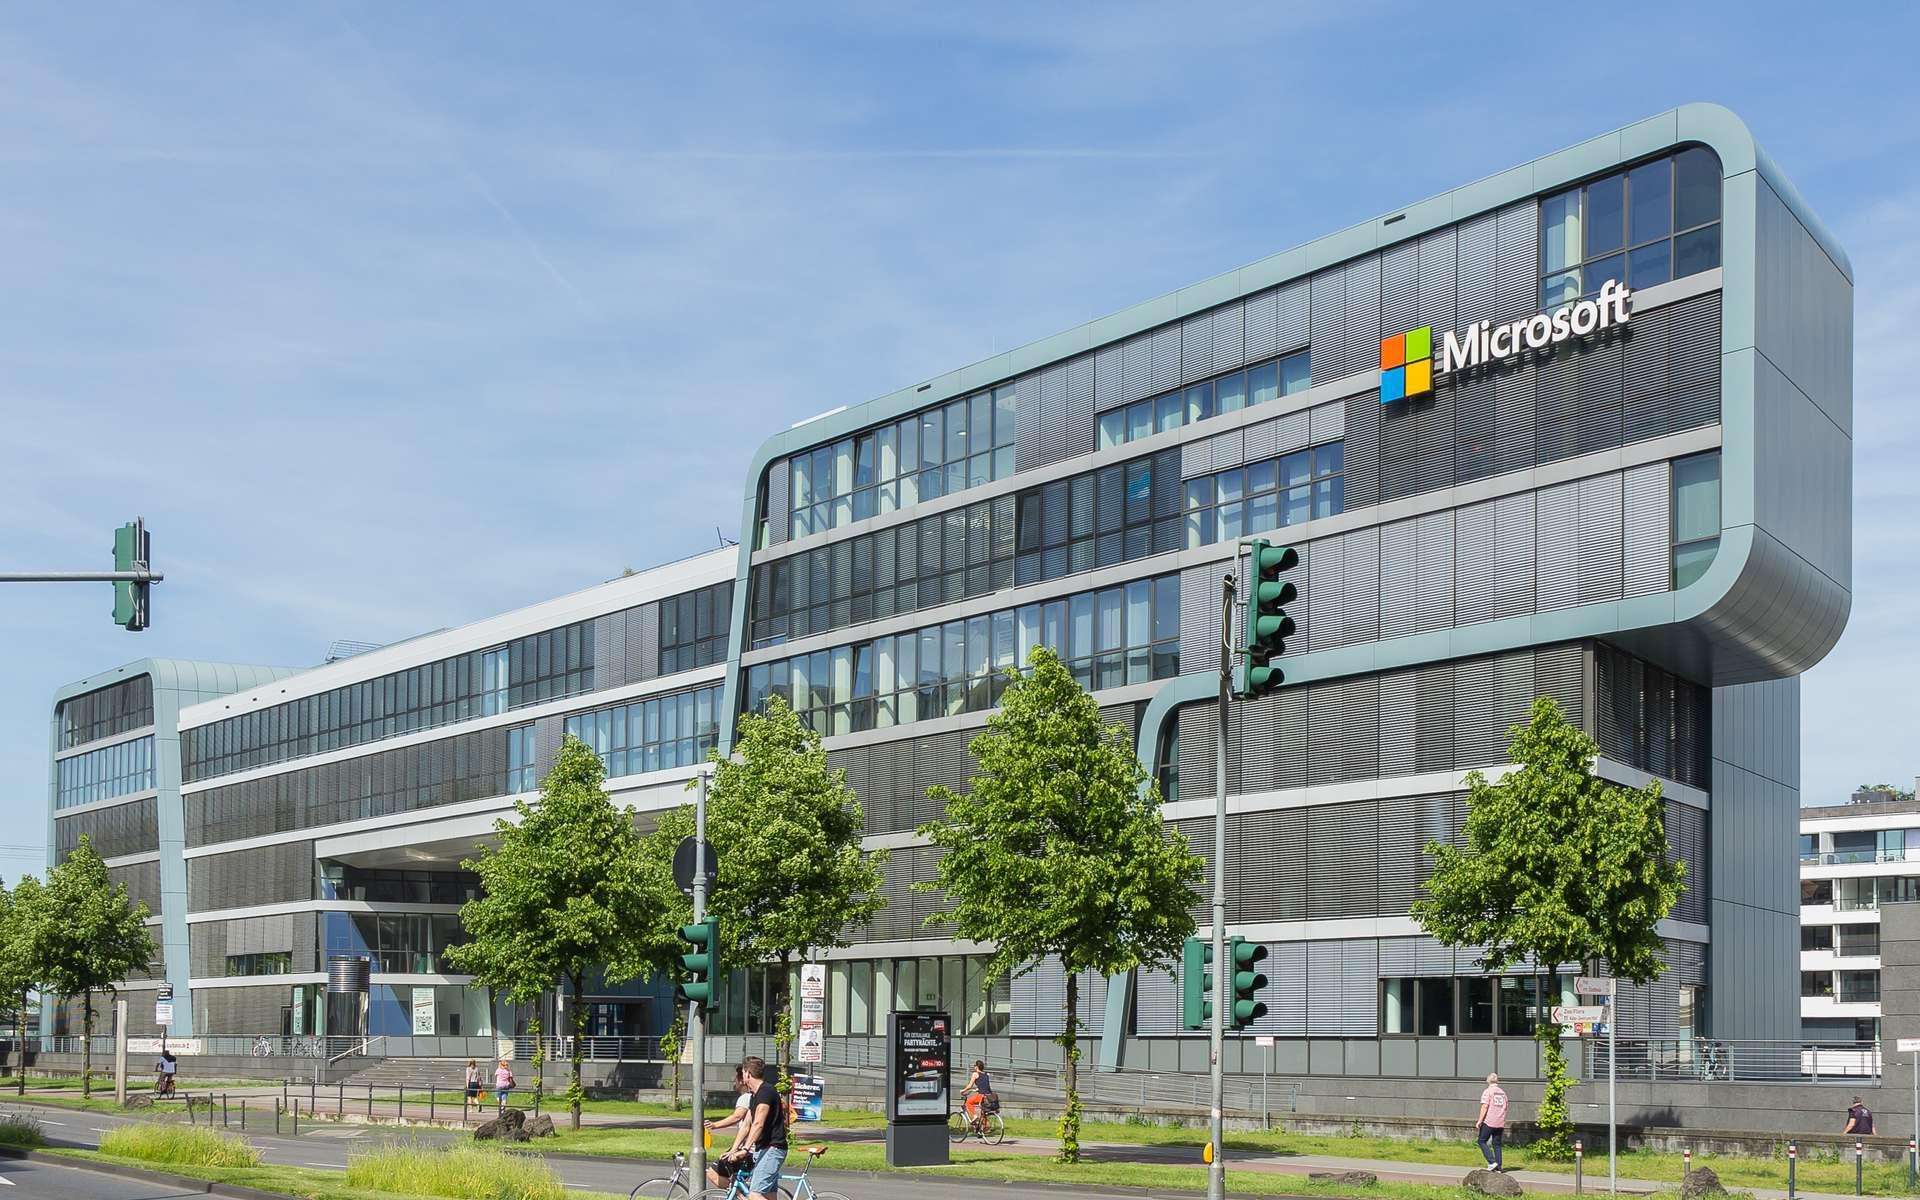 Le siège social de Microsoft © Wikimedia